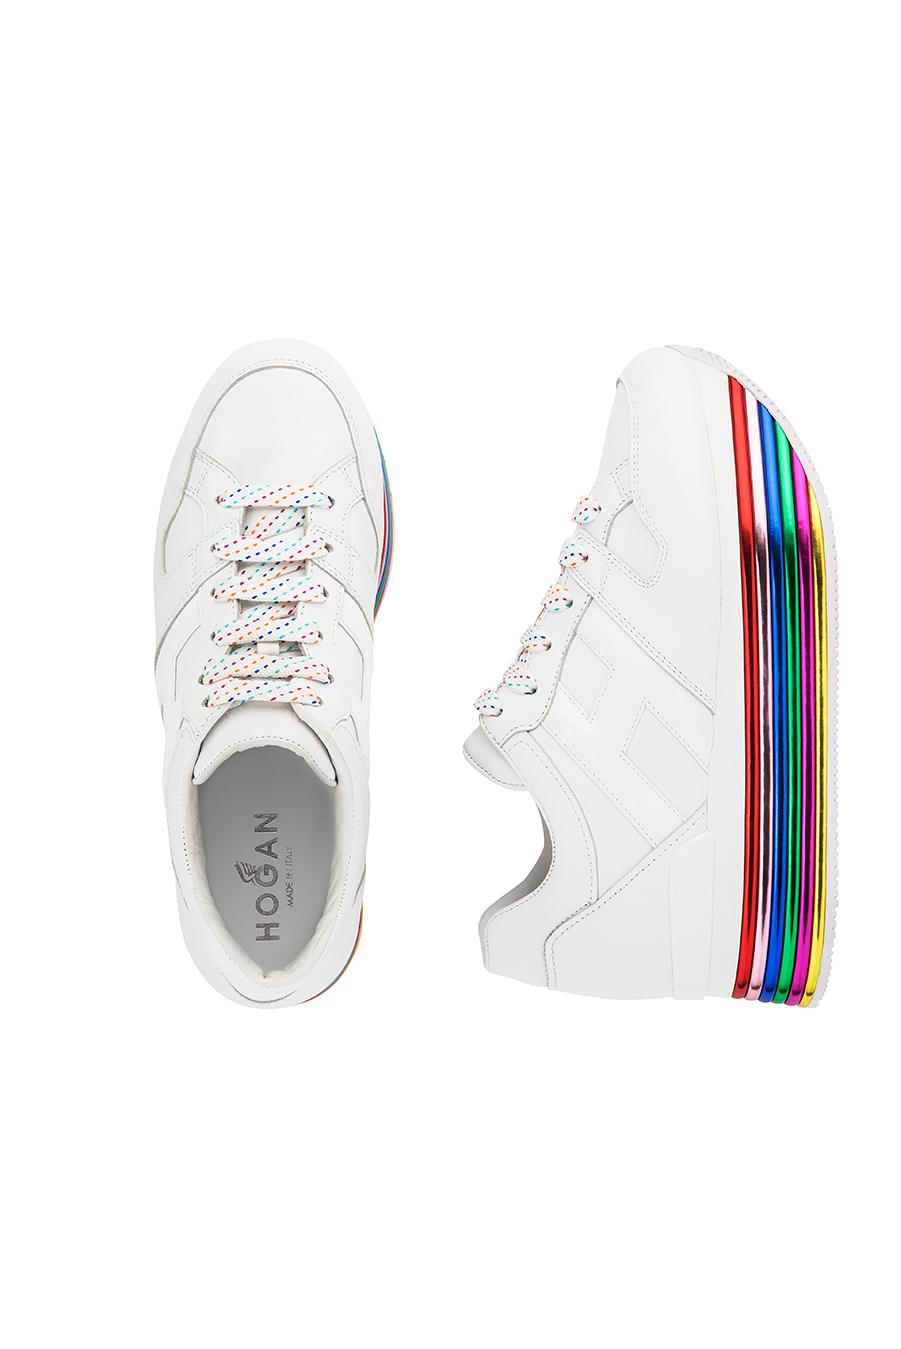 Hogan Sneakers 001-hogan-w-ss18-look-book-gyw3520t54i6sb001-009-b